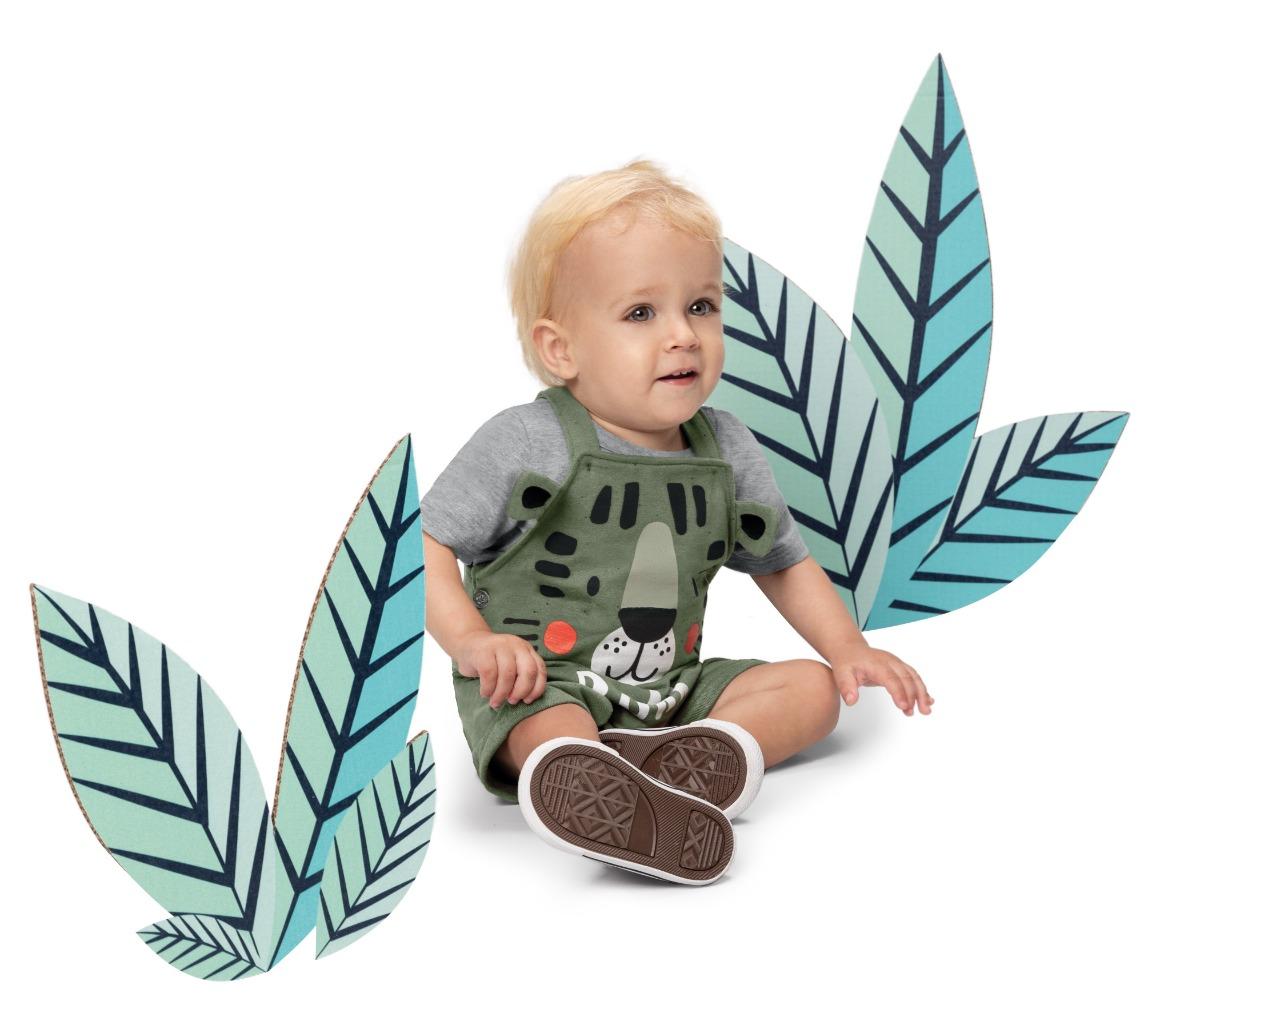 Conjunto infantil menino blusa manga curta e jardineira Zig Zig ZAA- Tam 1 a 3 anos